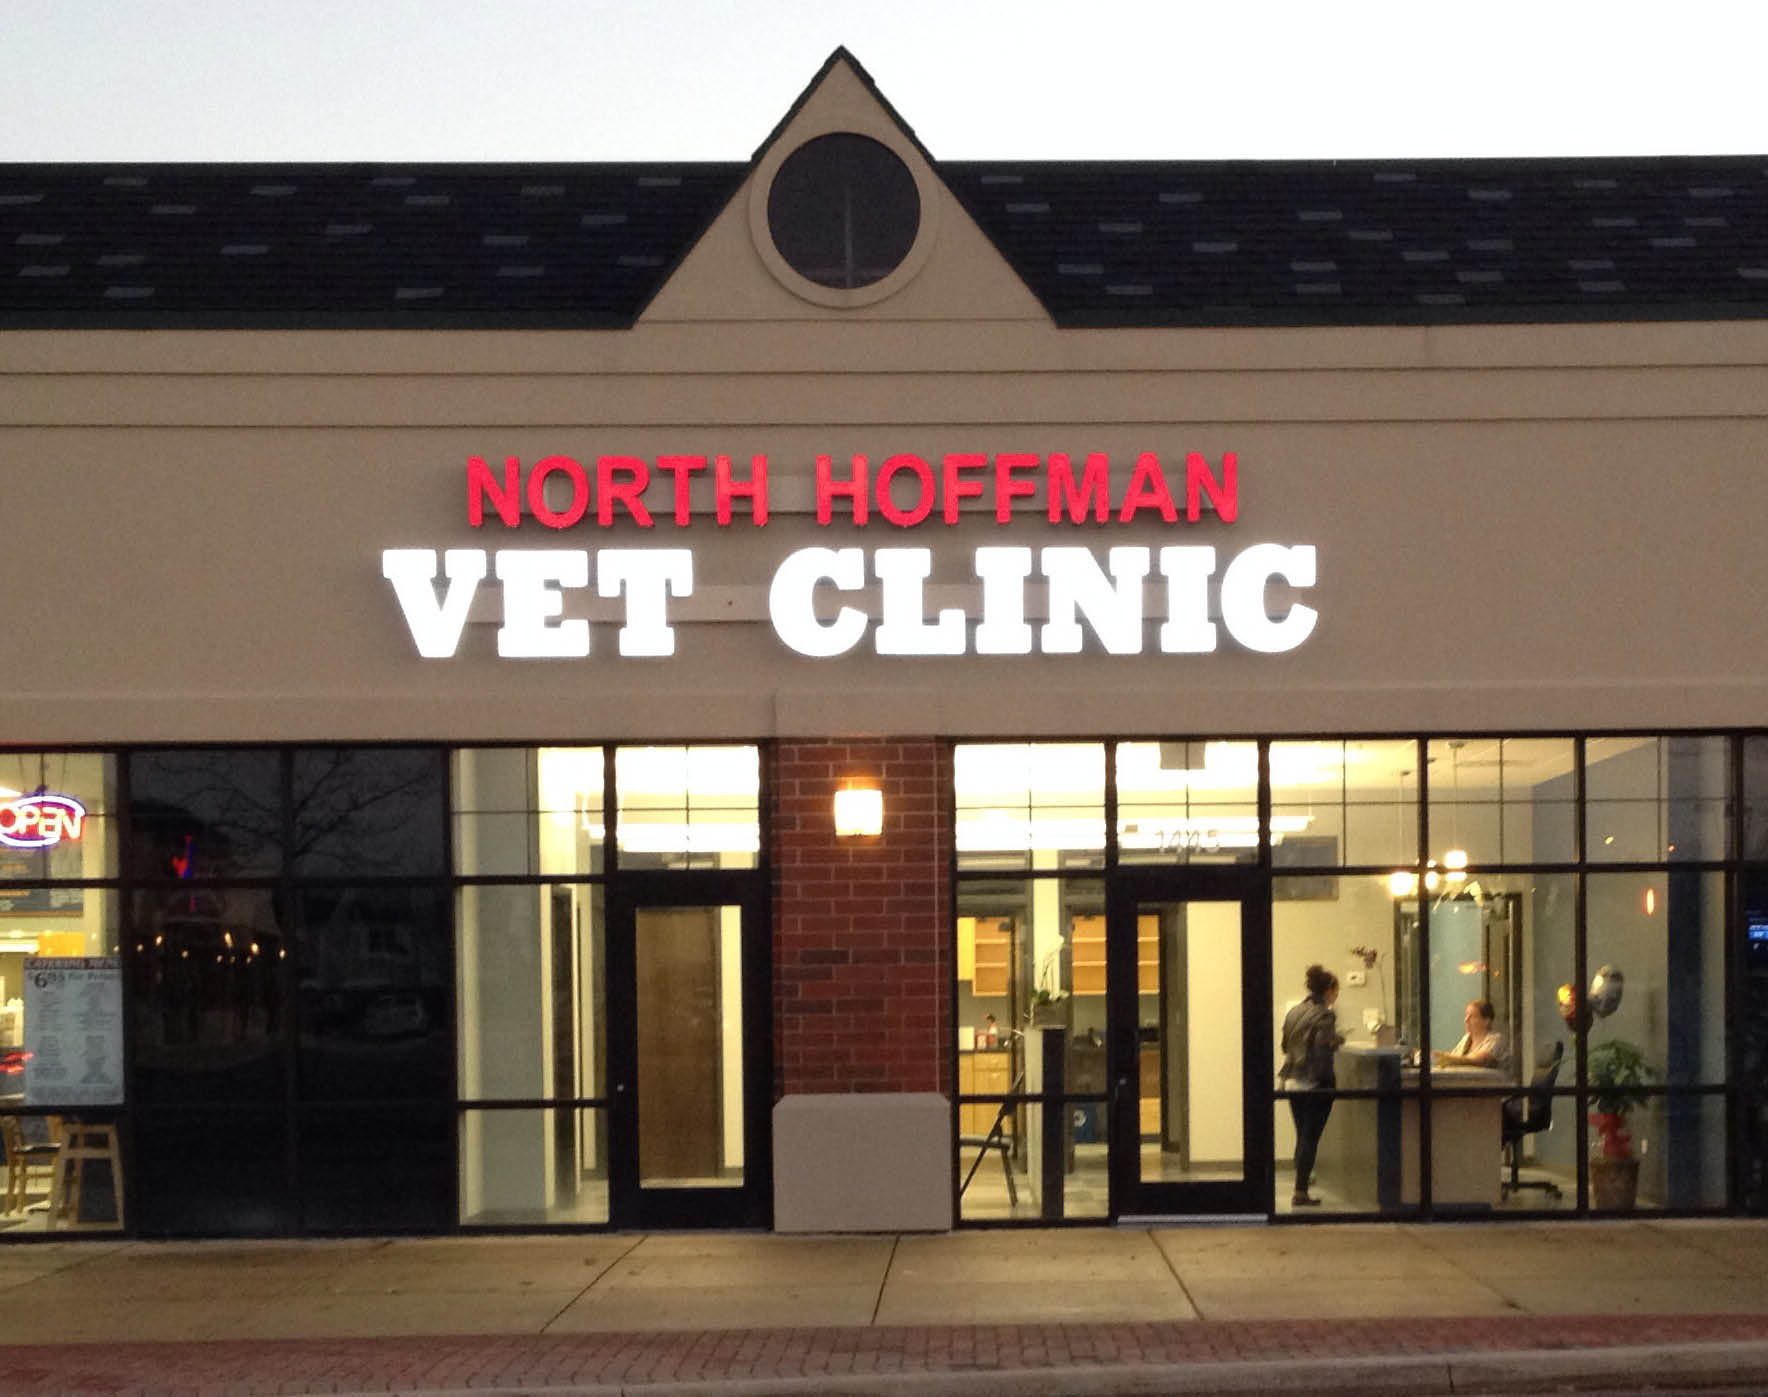 North Hoffman Veterinary Clinic location entrance in Hoffman Estates, IL